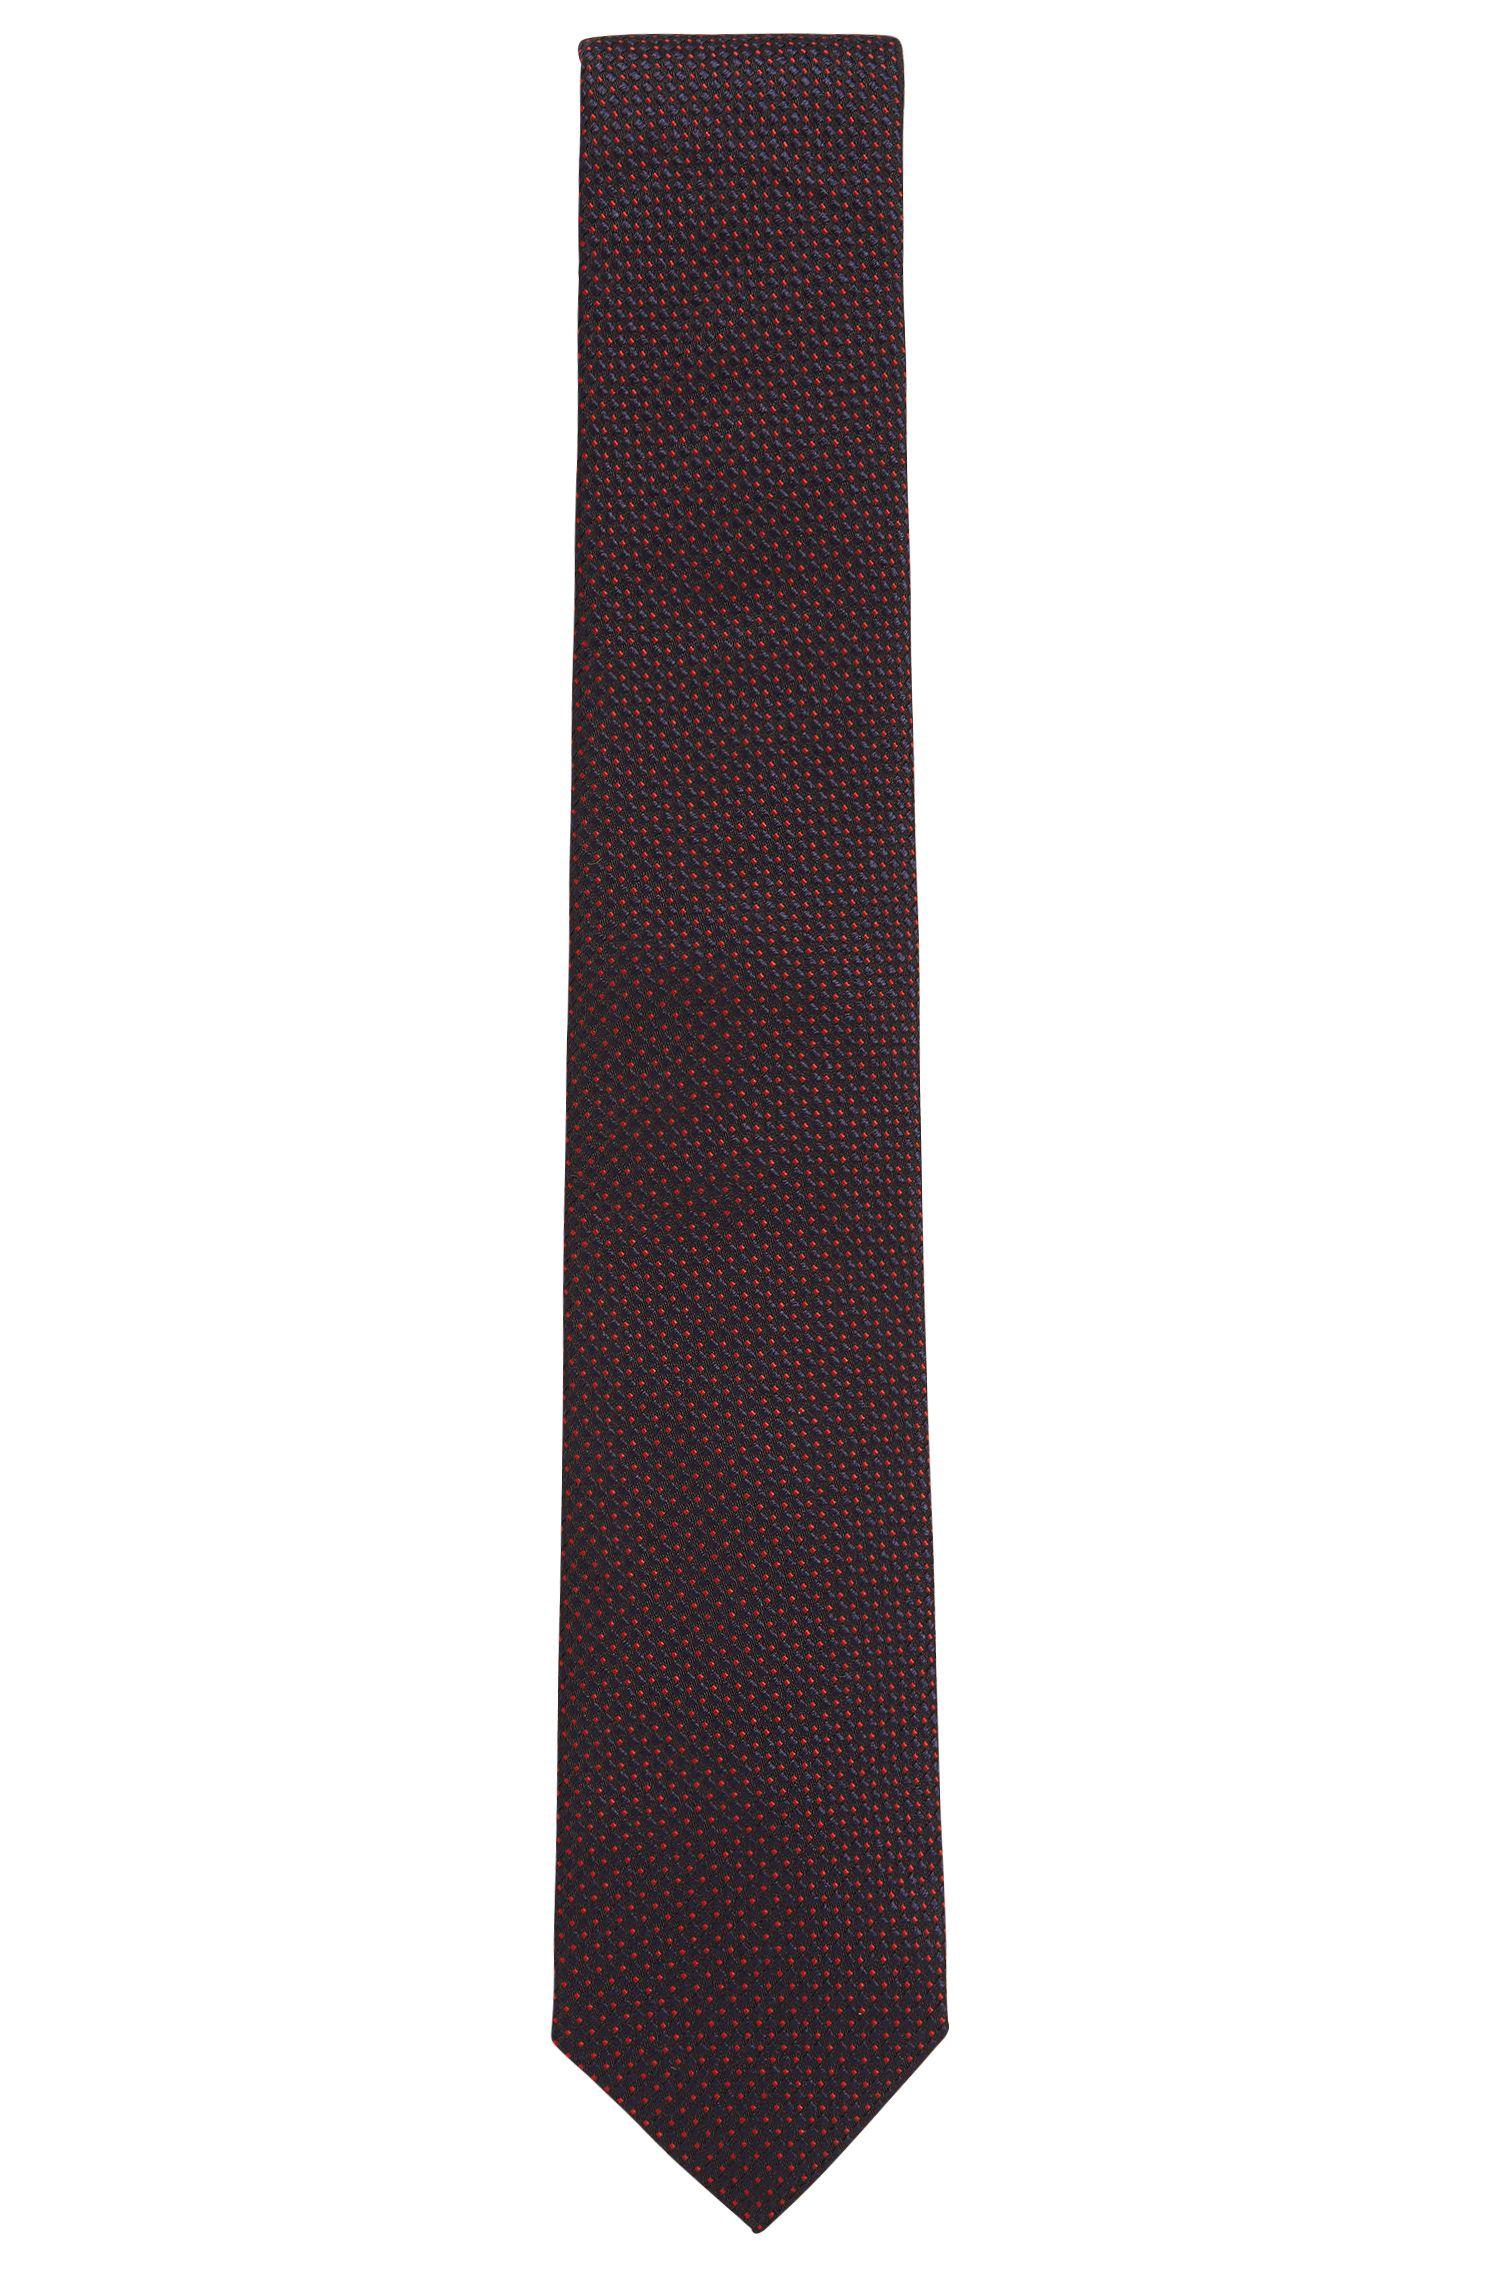 Pindot Italian Silk Tie